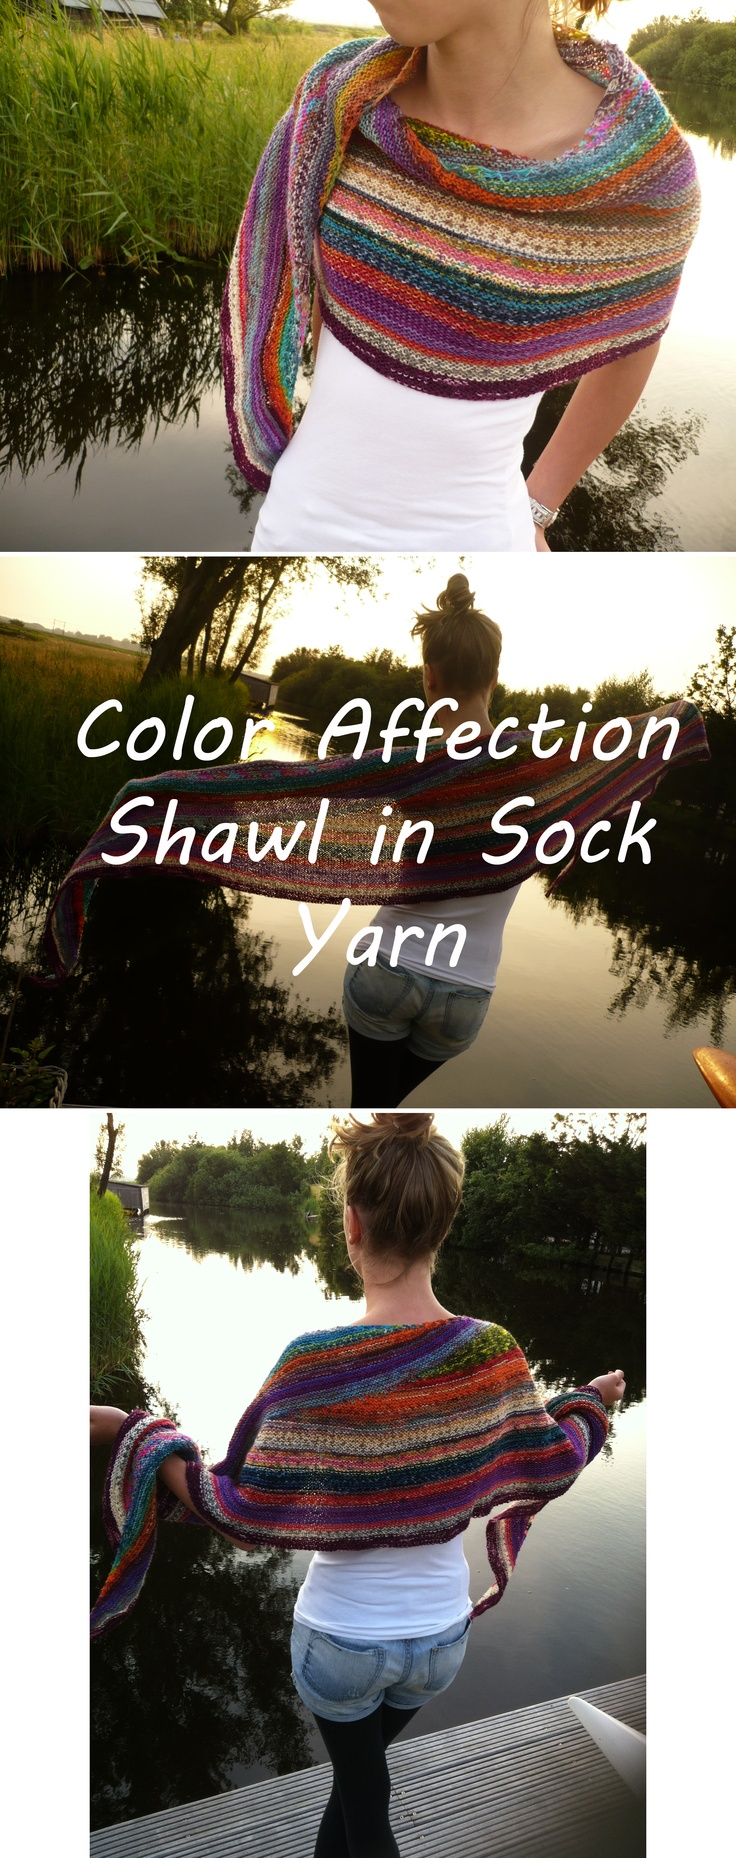 'Color Affection Shawl' using leftover sock yarn